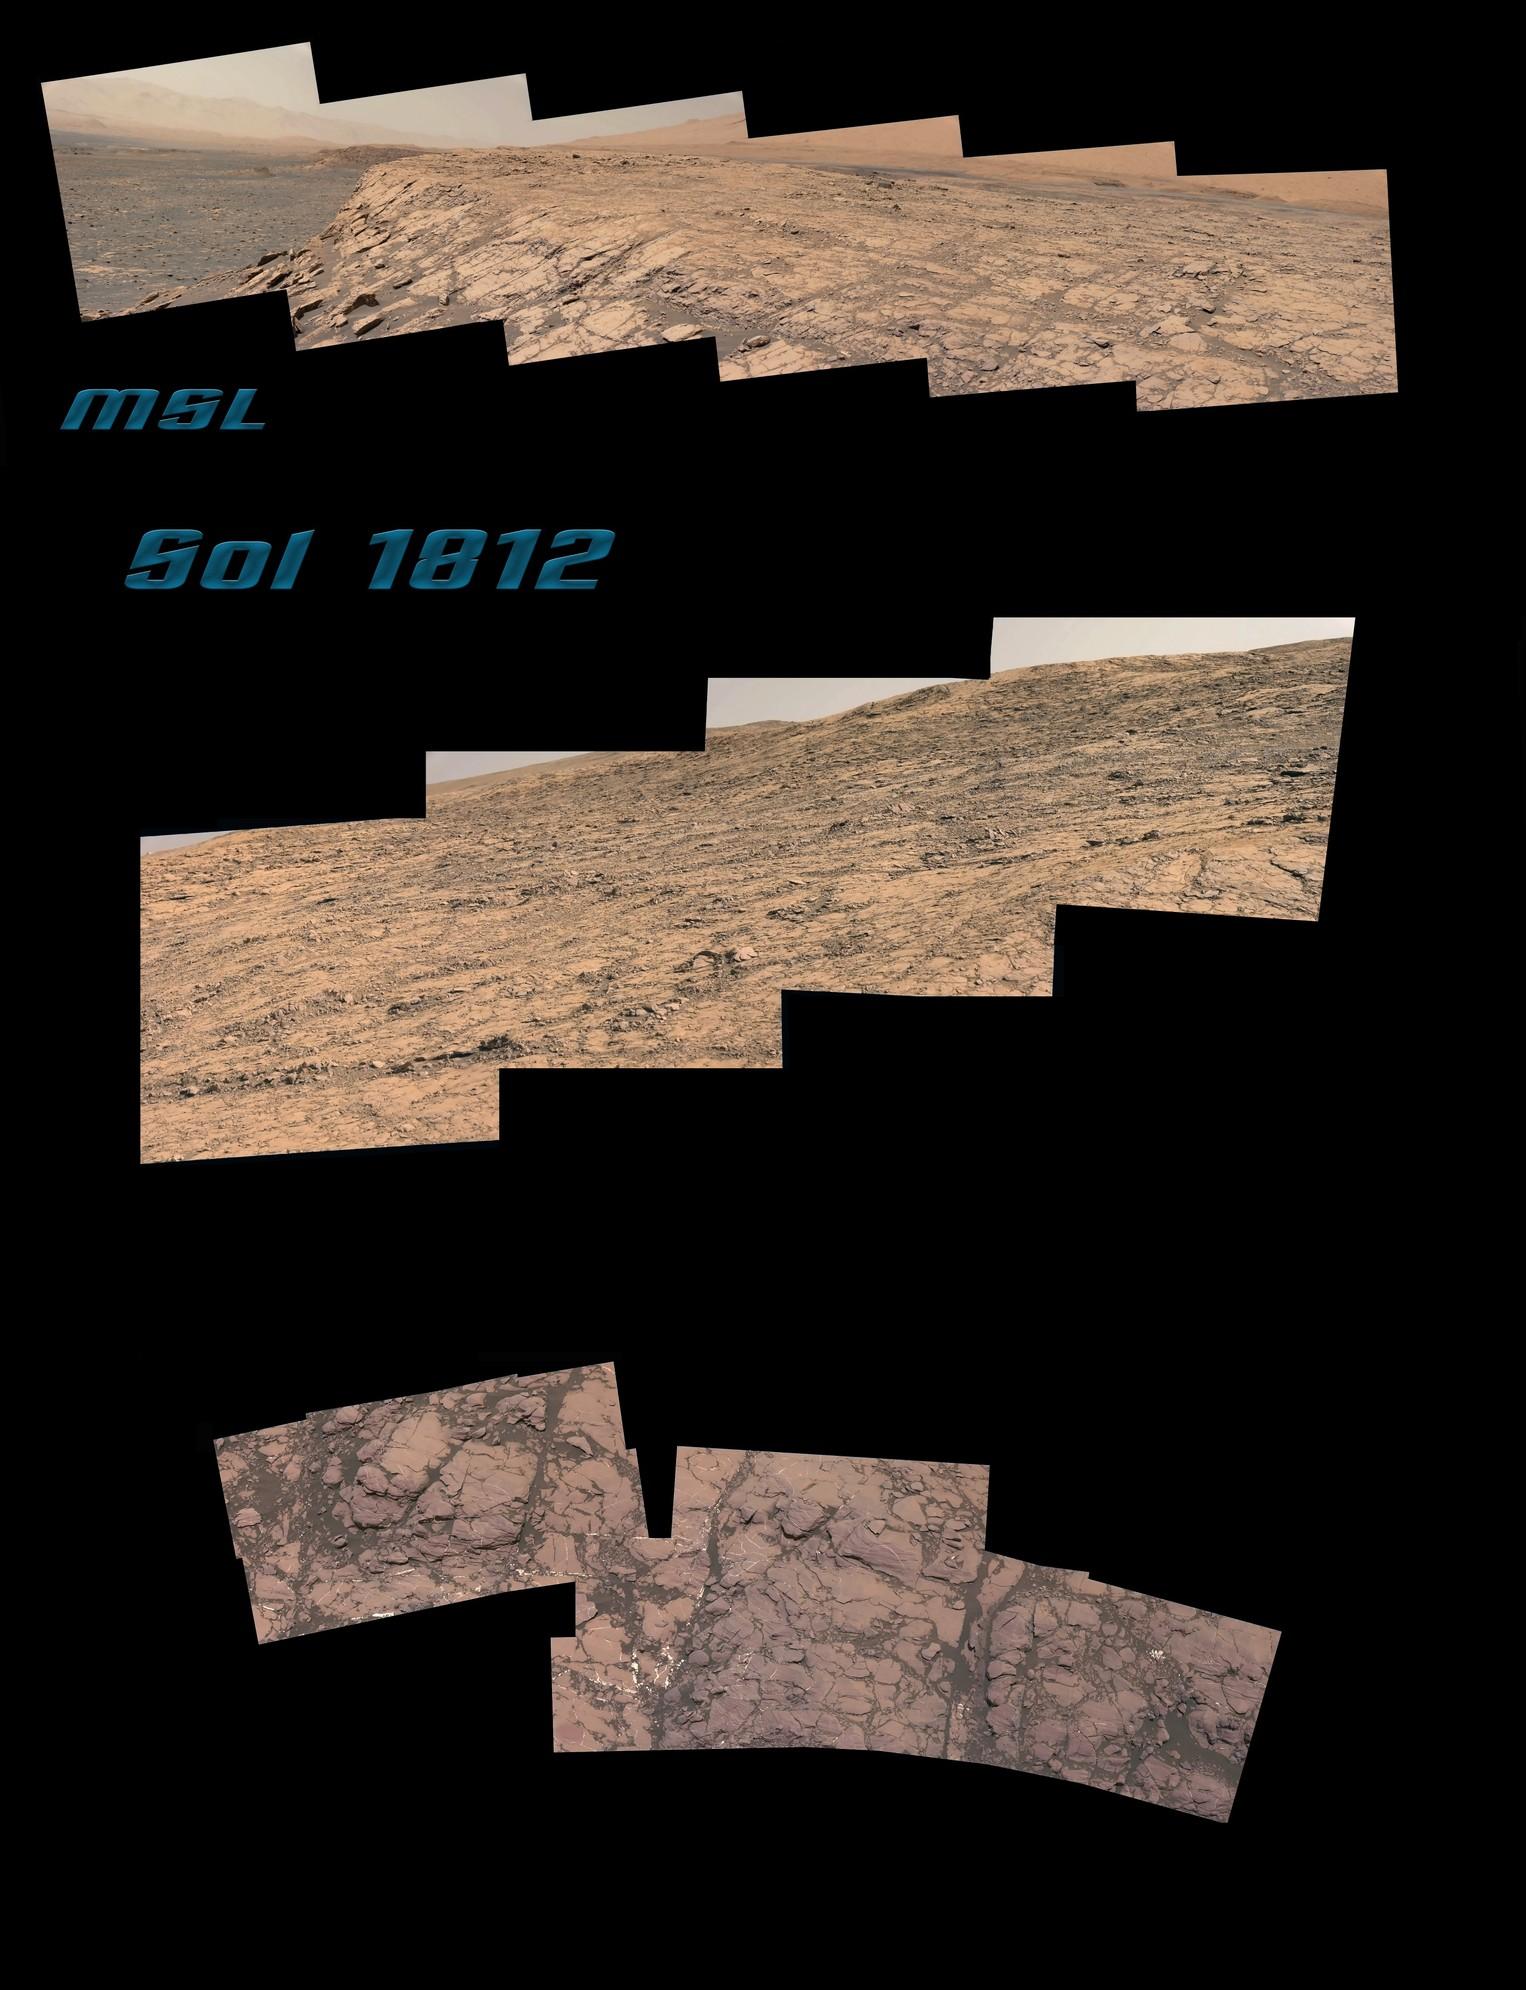 MSL Curiosity - Sol 1812 - Mastcam Composite [Pds]